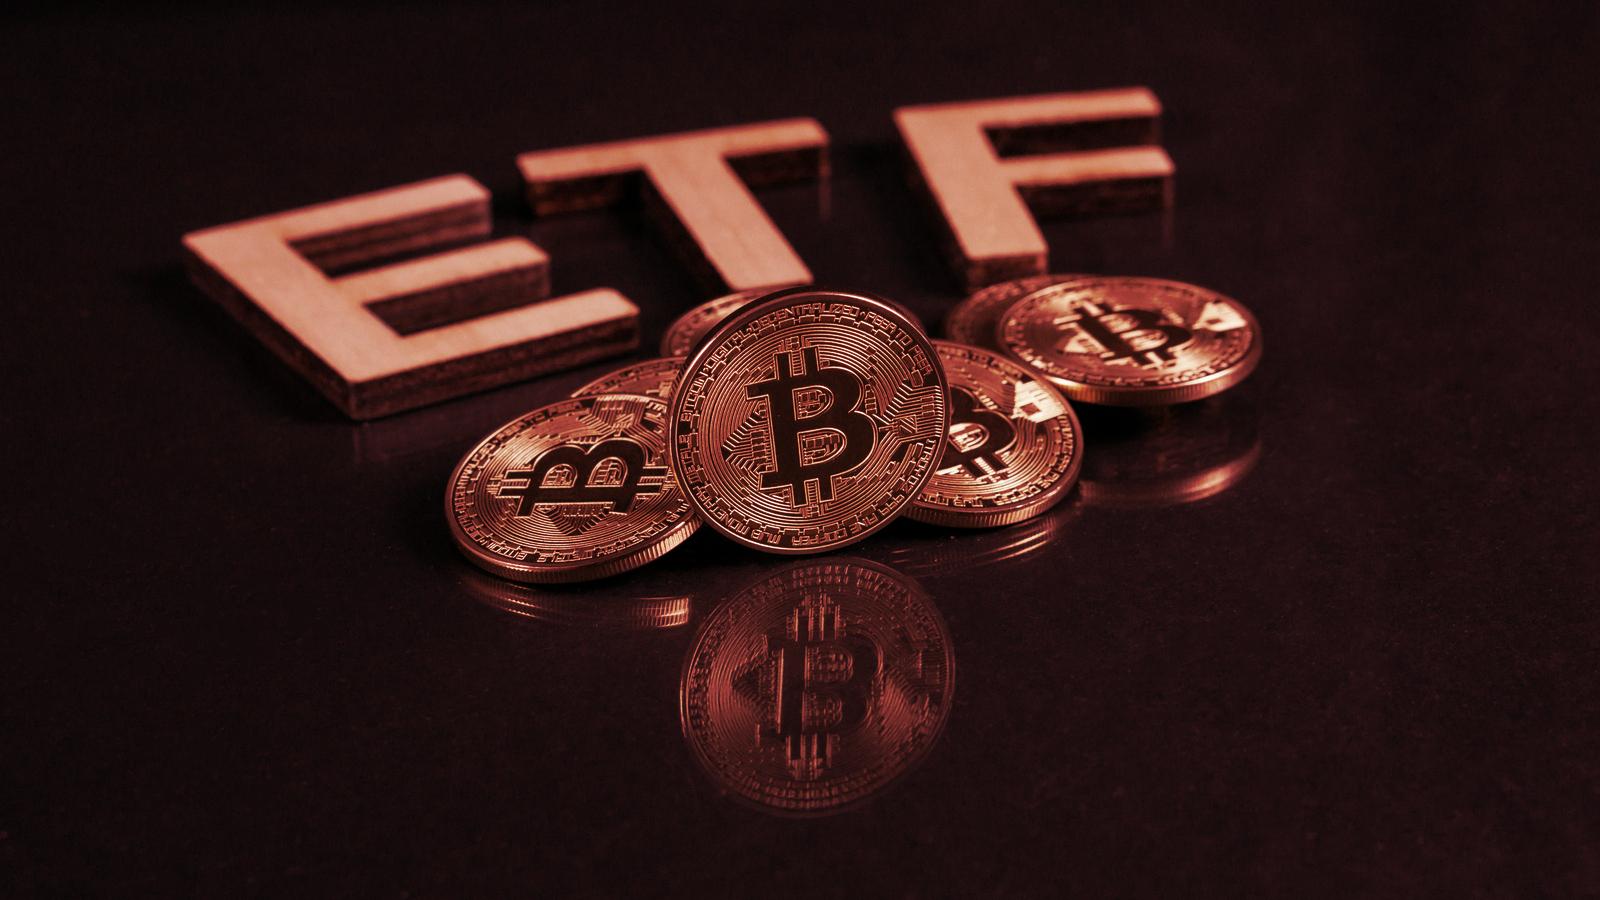 Bitcoin ETFs in Canada Hit by 'Market Disruption' Amid Crypto Crash